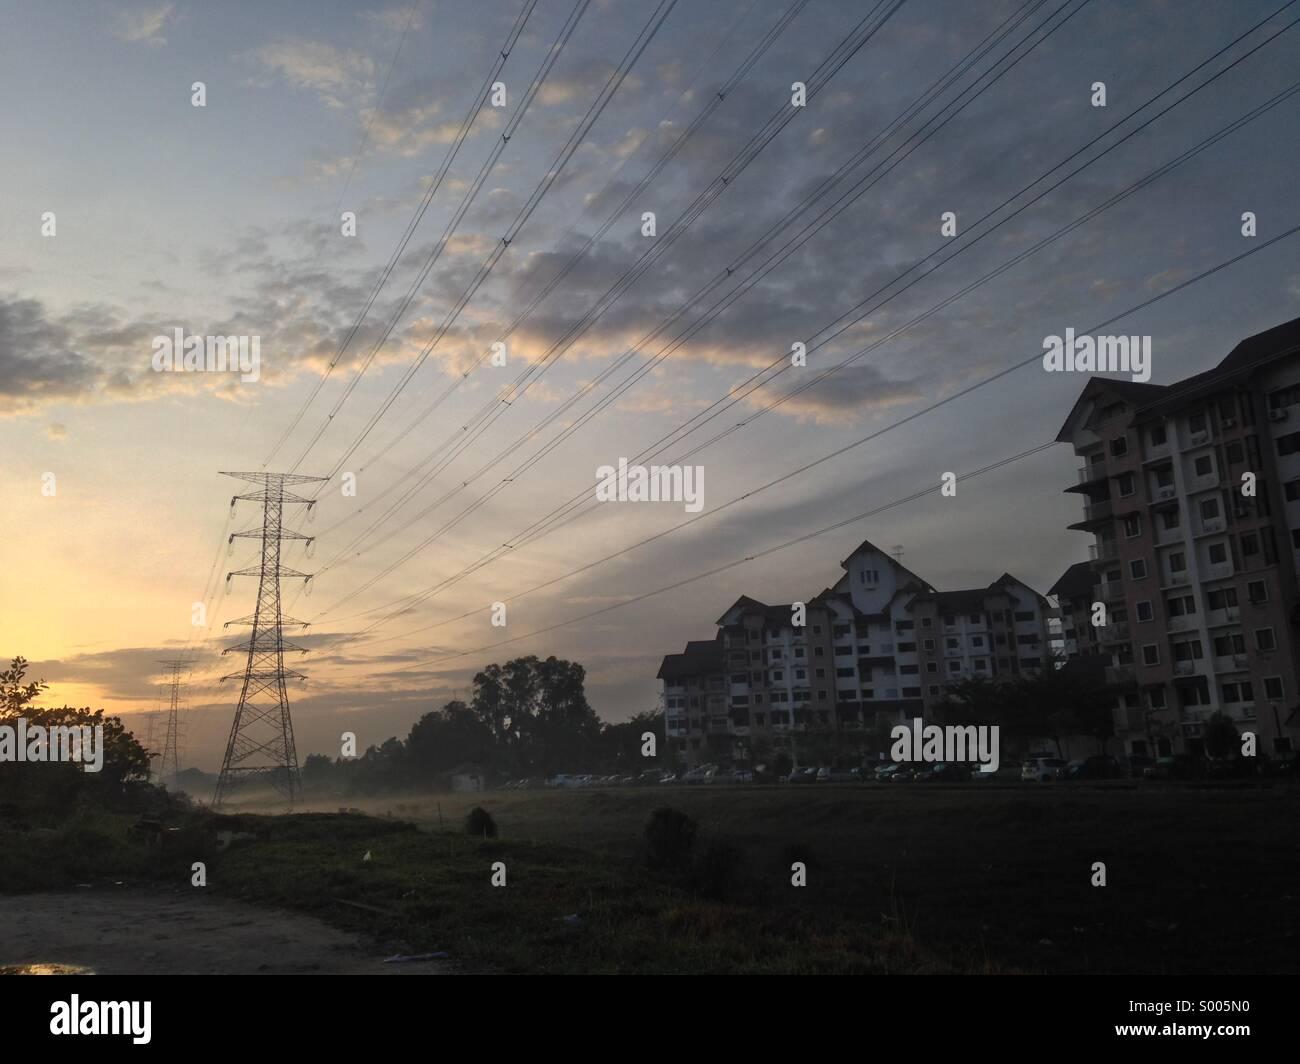 Powerline grids - Stock Image